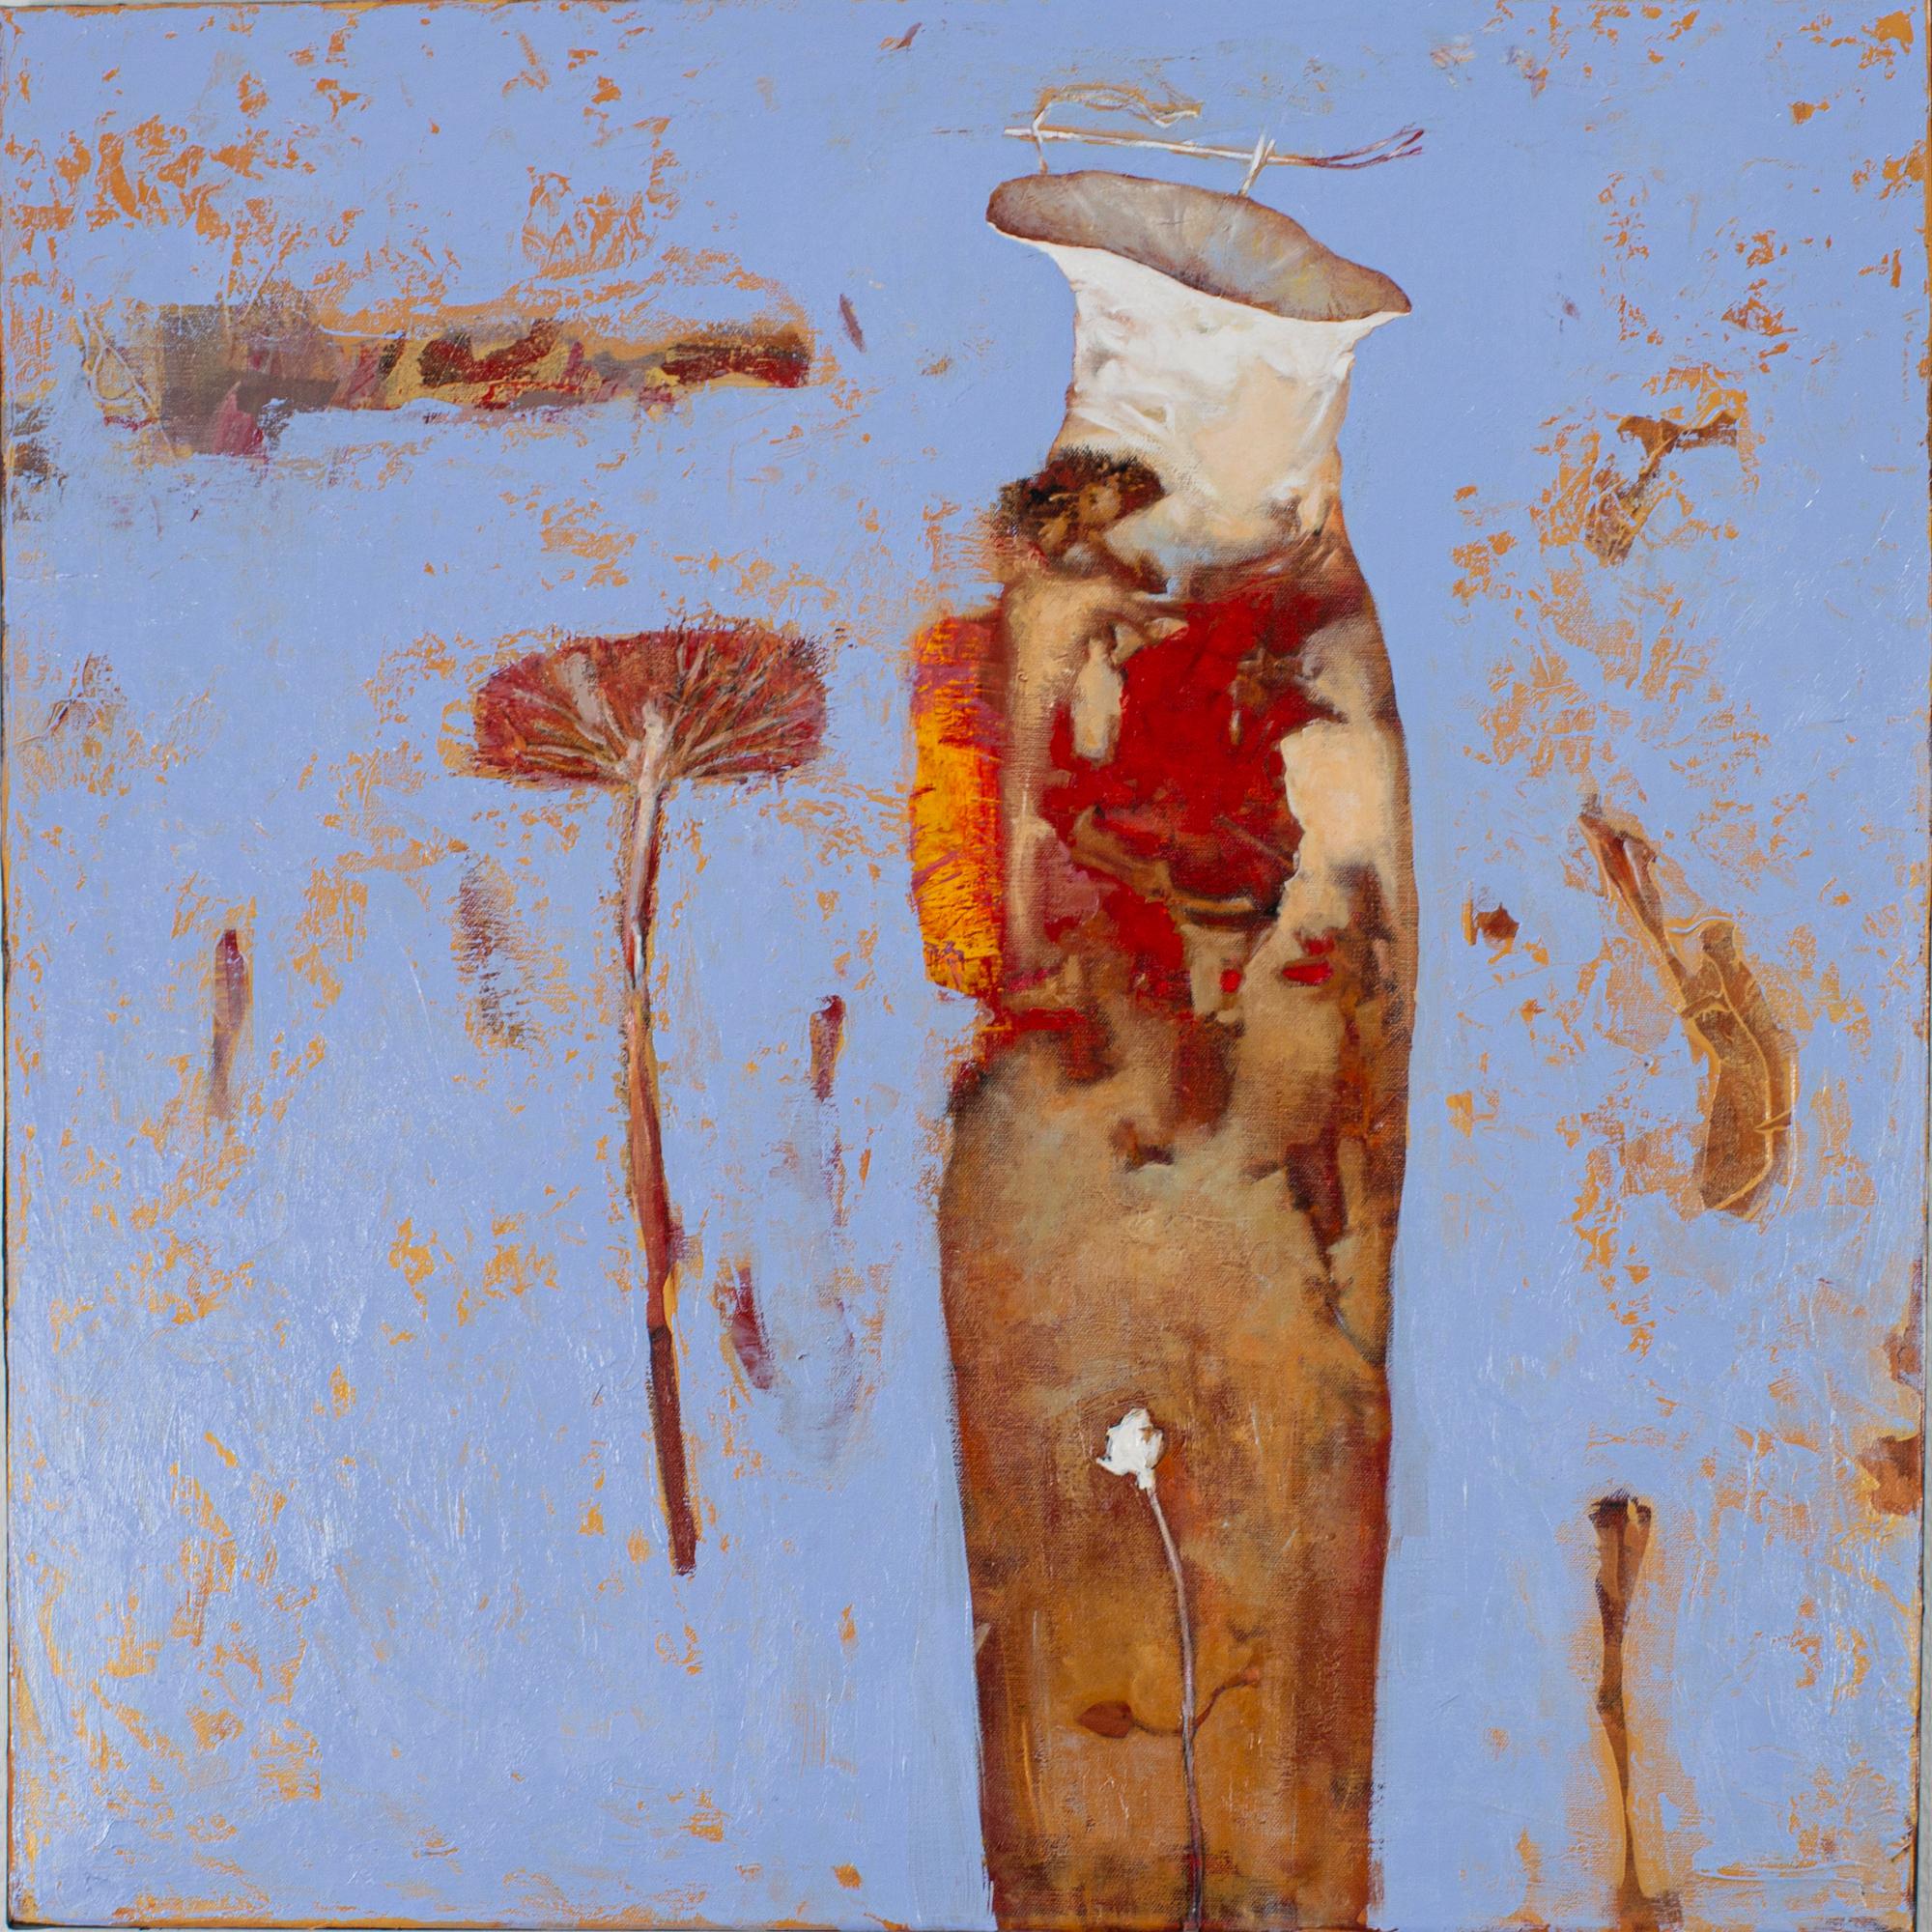 Oleg Bondarenko - Organic vase I, oil painting